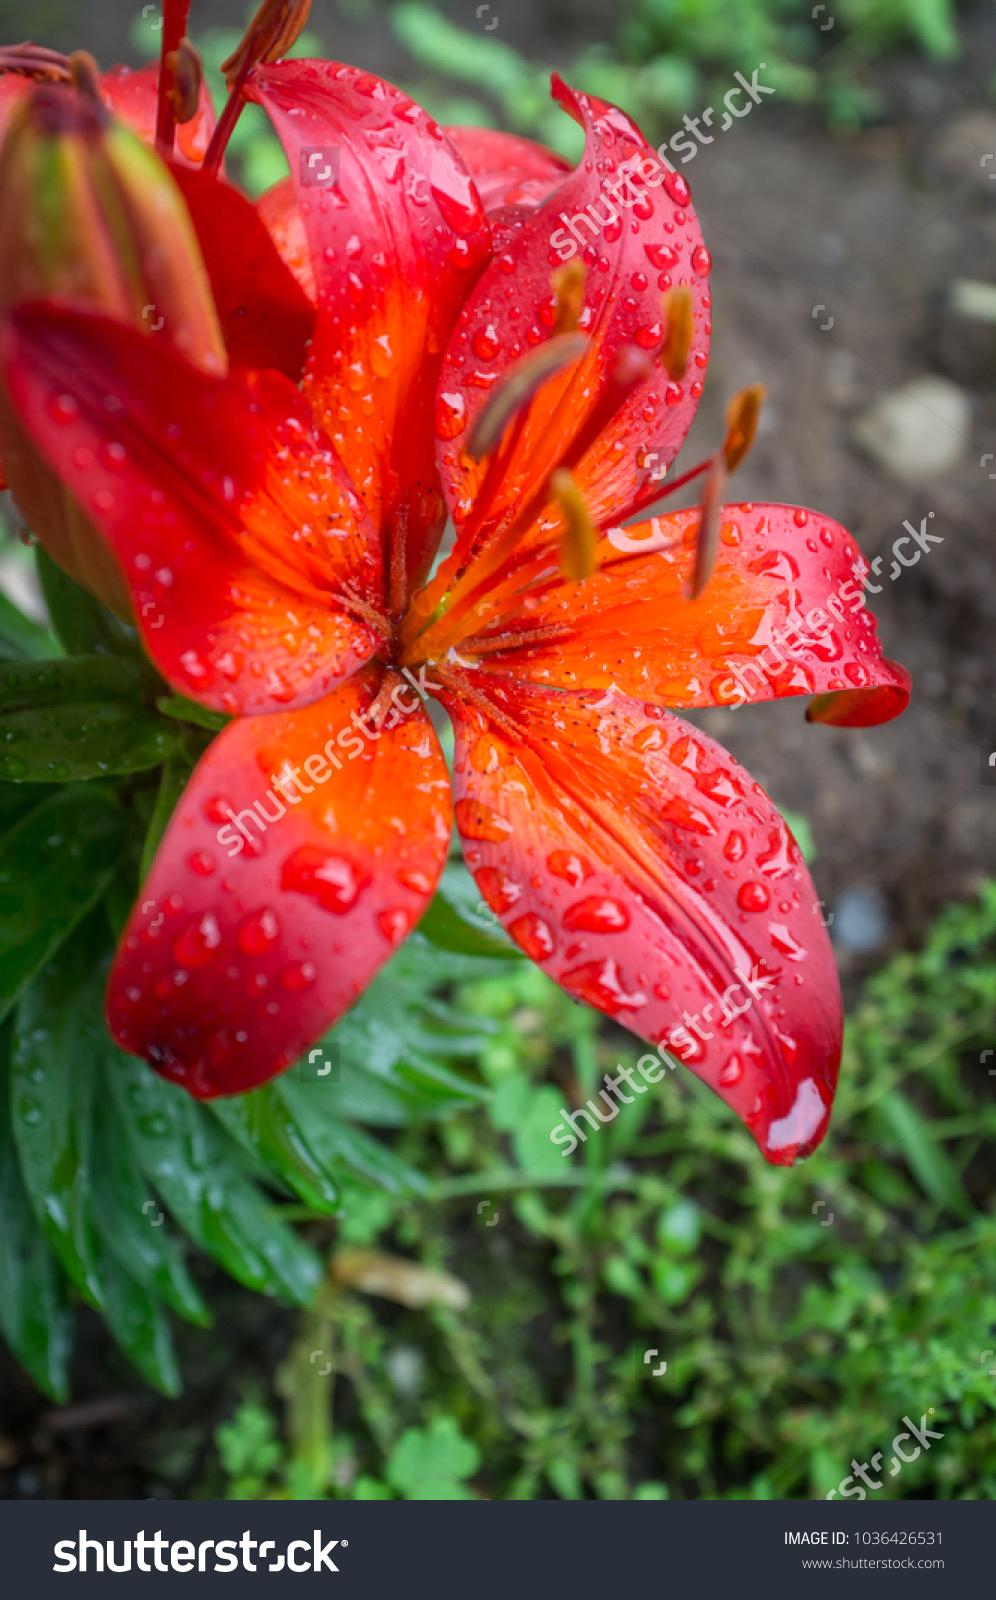 Garden red lily flowers wet summer stock photo edit now 1036426531 garden red lily flowers wet from summer rain izmirmasajfo